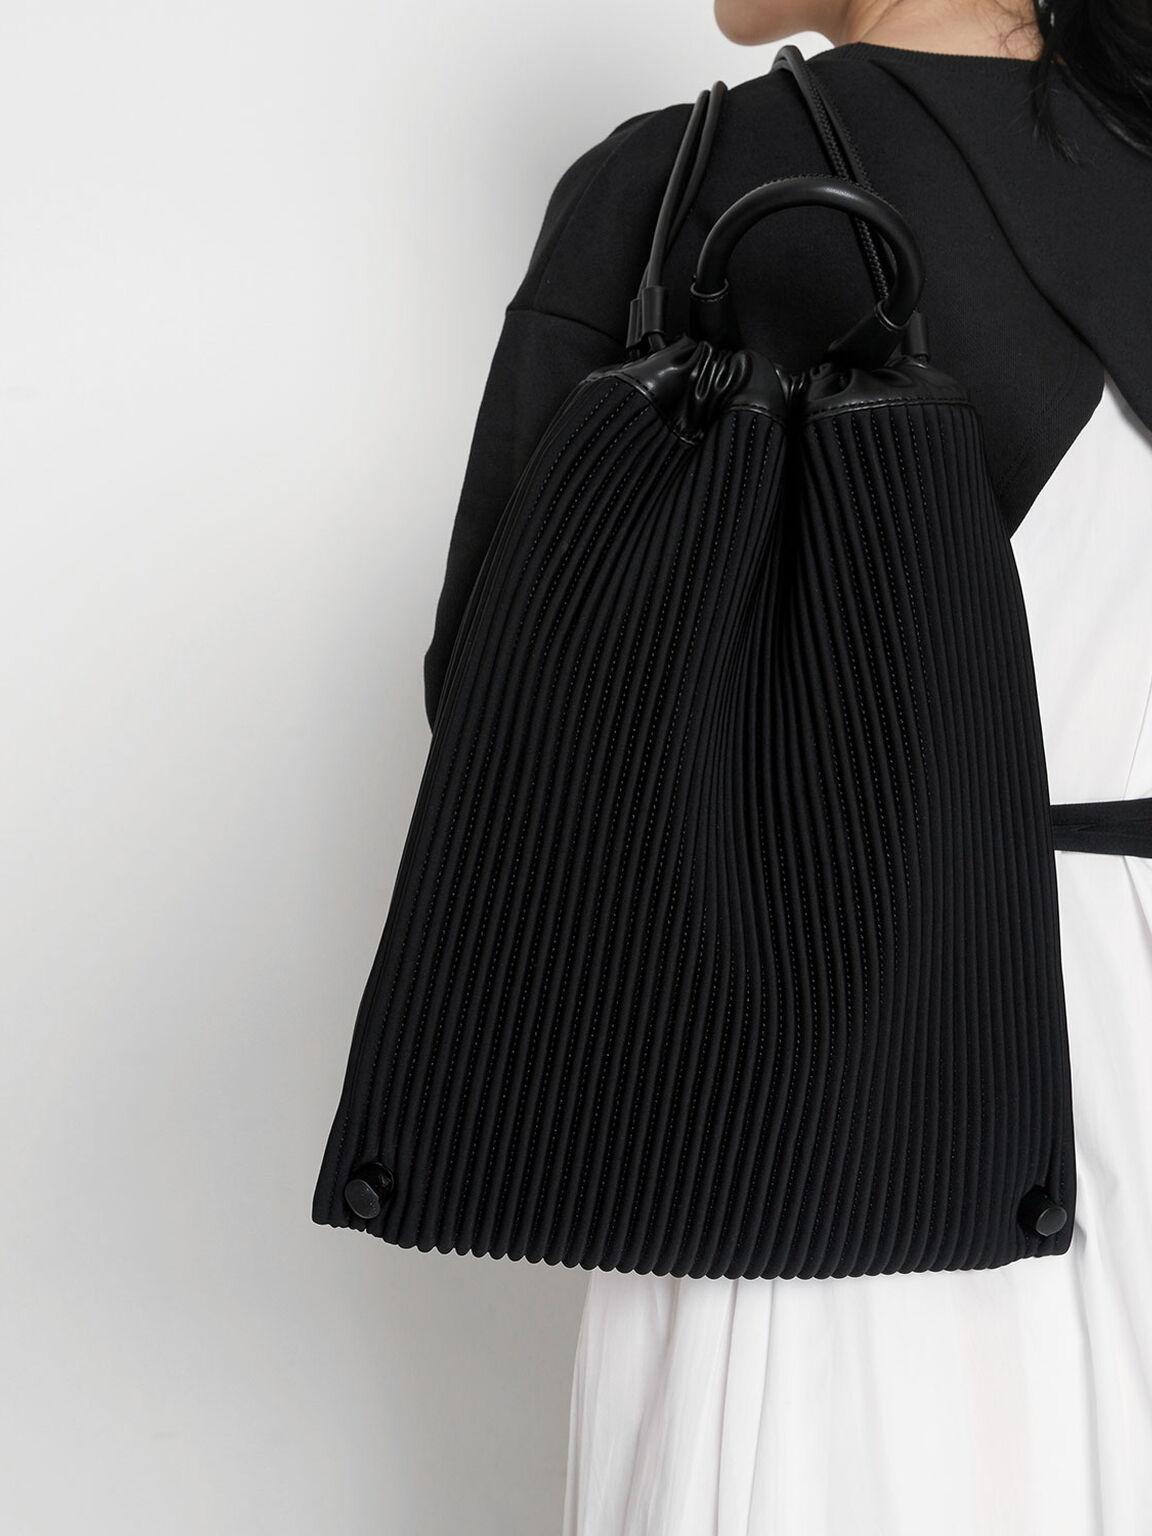 Large Neoprene Drawstring Backpack, Black, hi-res